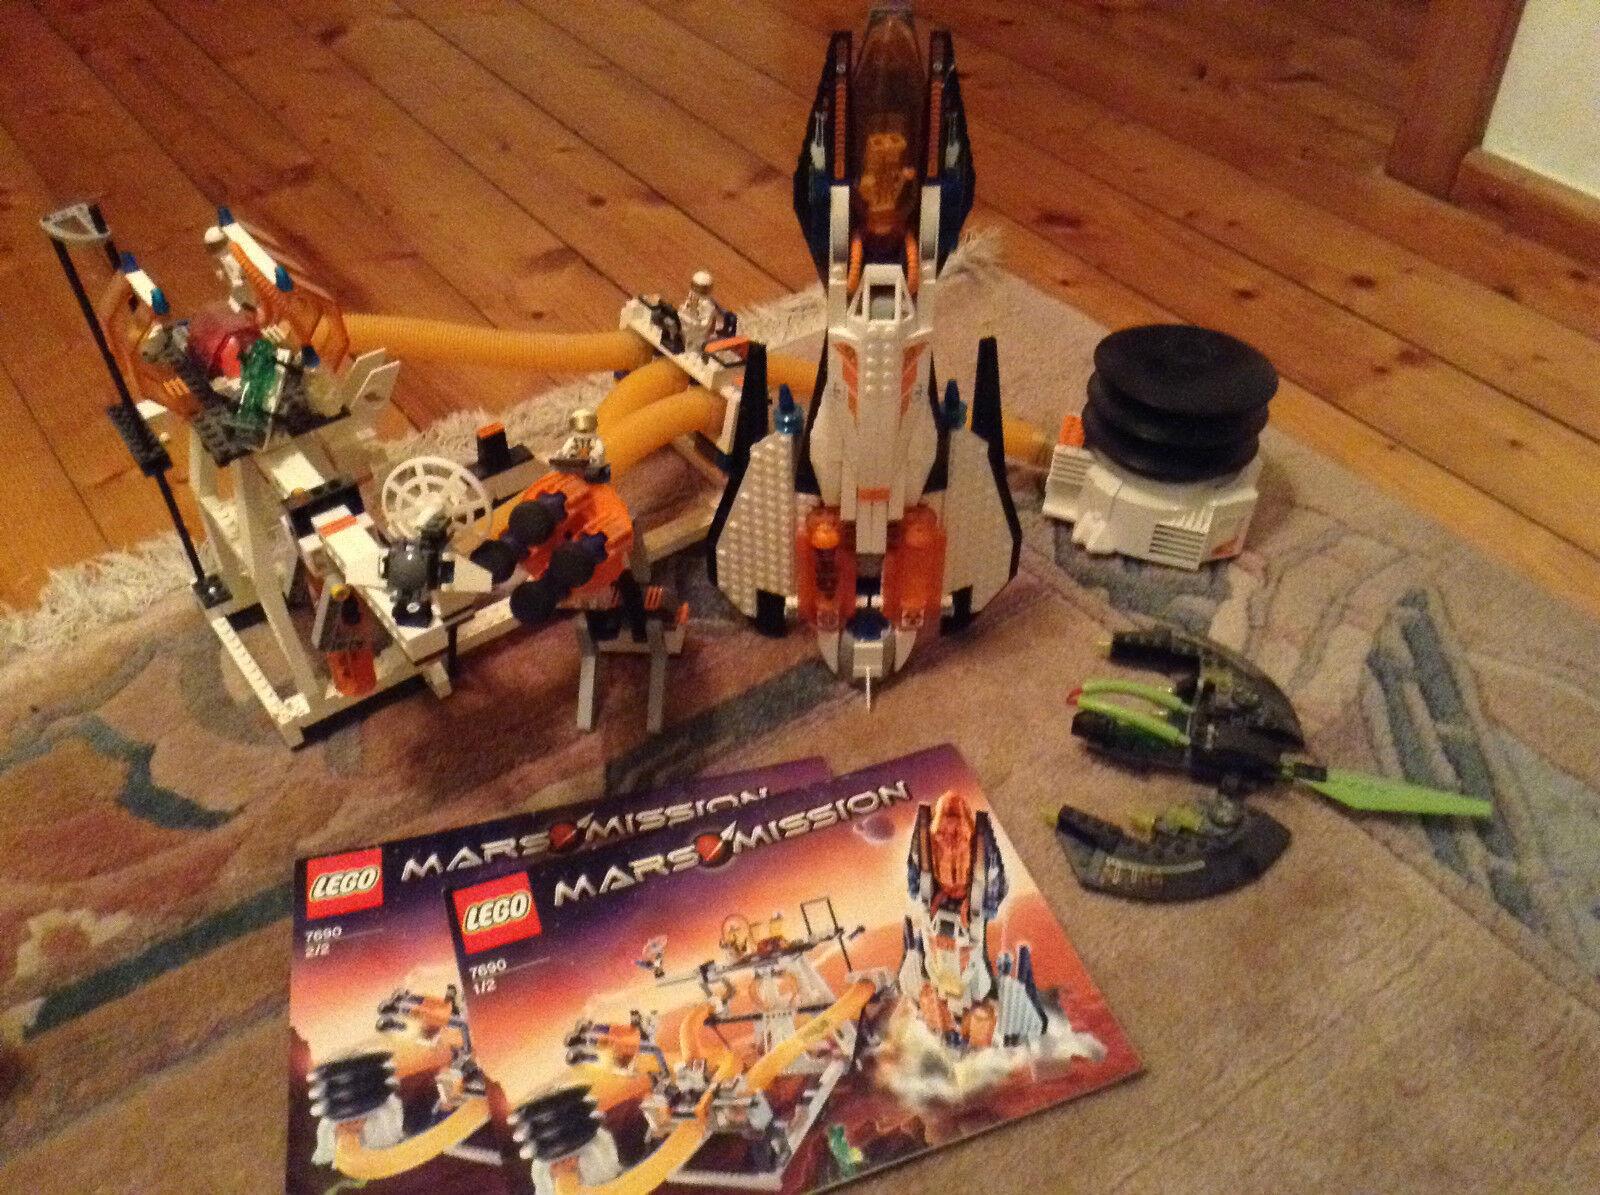 LEGO Mars Mission 7690 7690 7690 MB-01Kommandozentrale a80a69